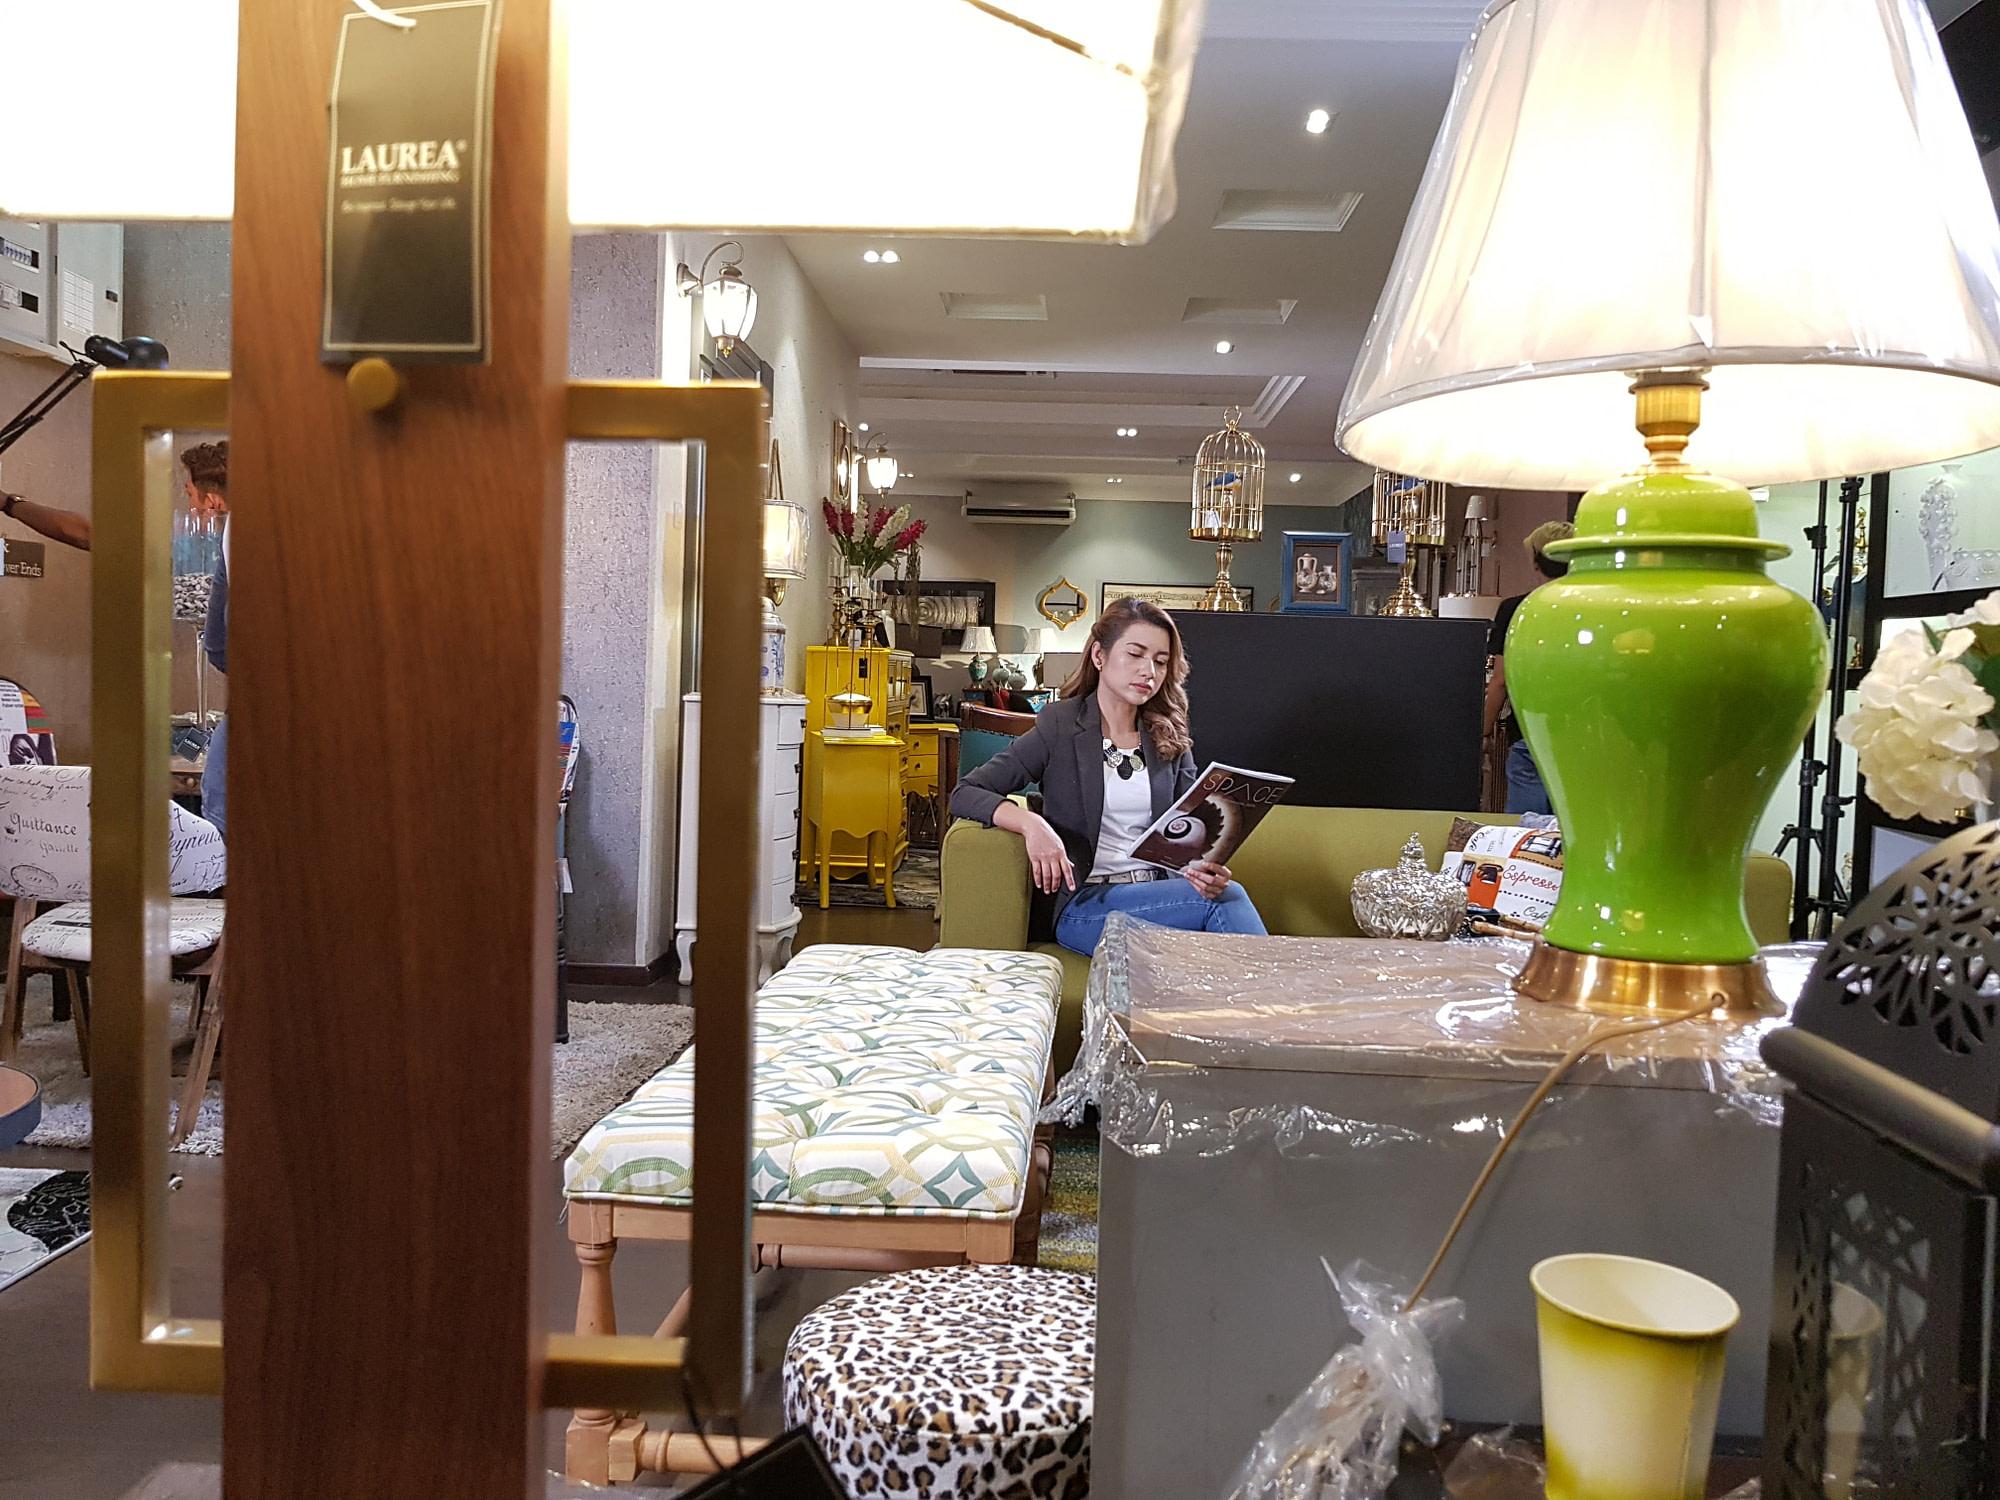 Laurea Interior Design & Home Furnishing Showroom | Laurea 2